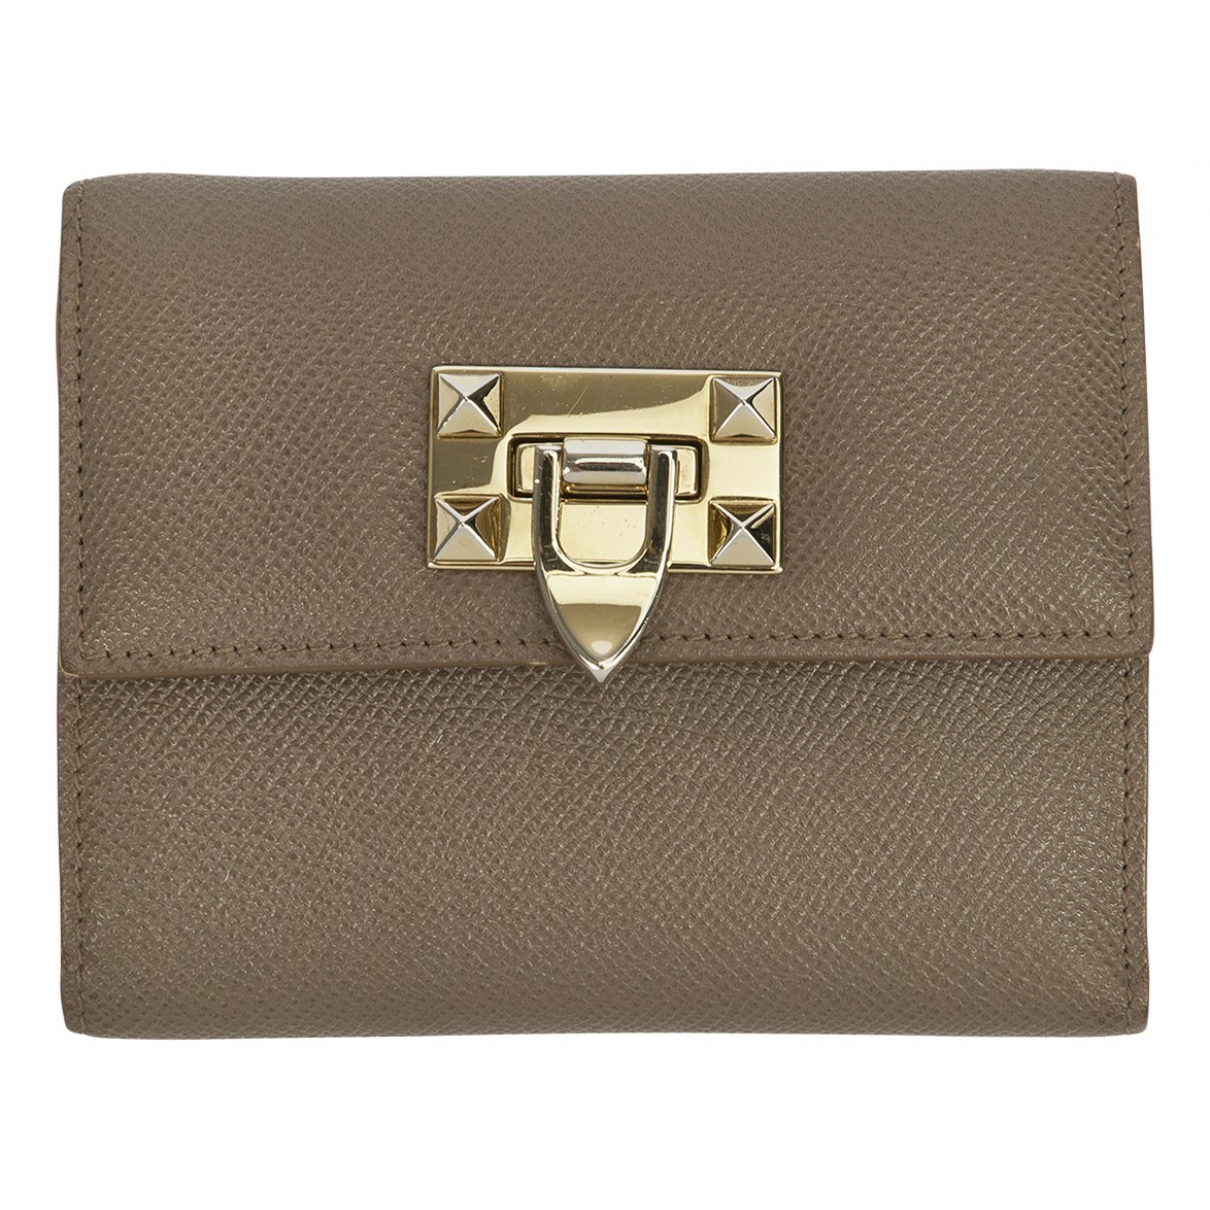 Valentino Garavani N Beige Leather wallet for Women N